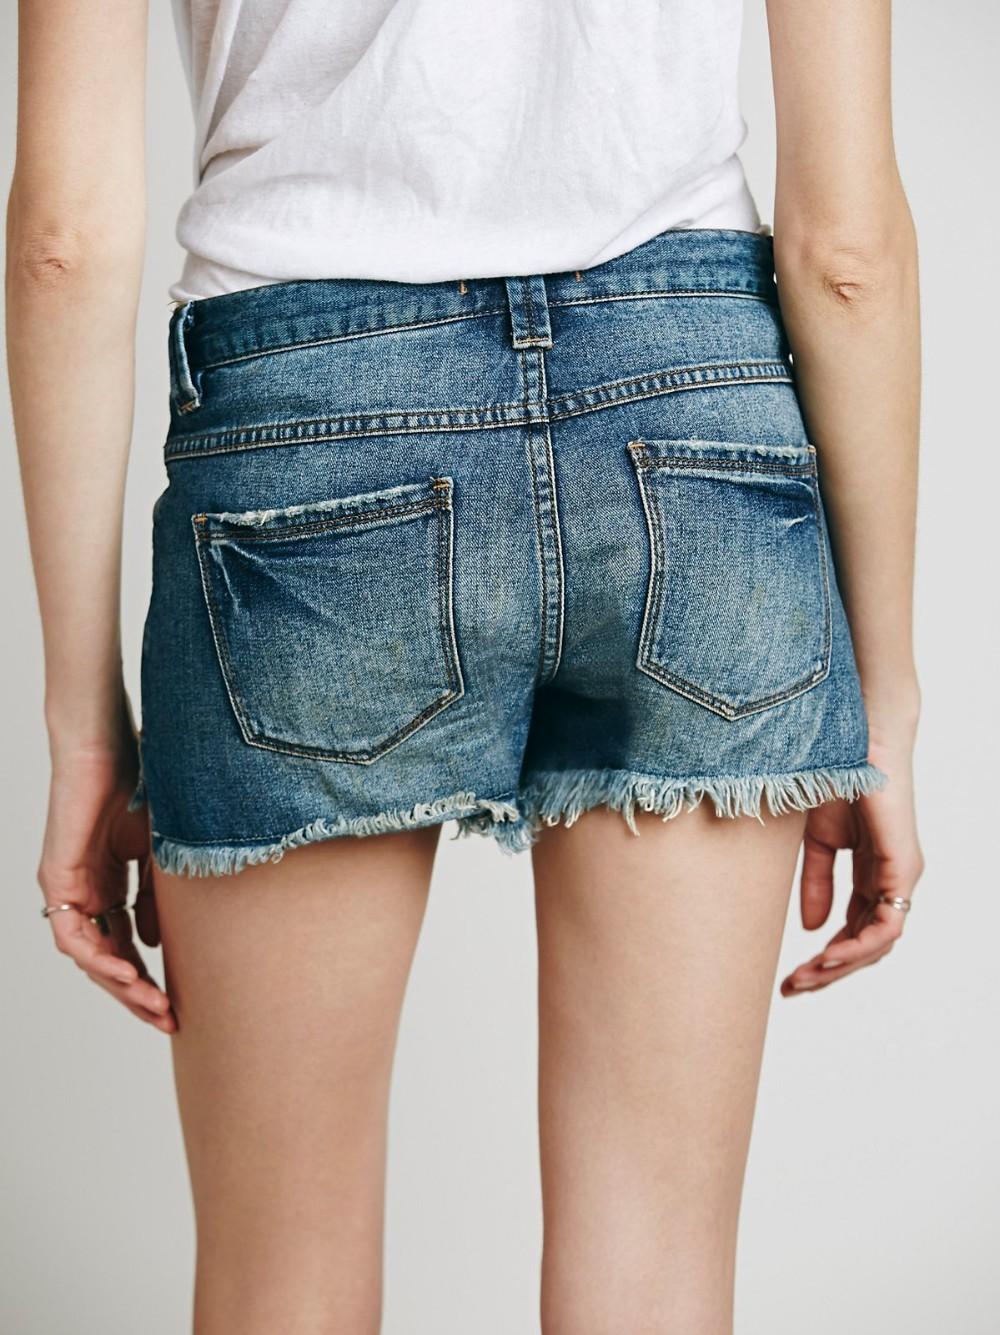 Rock Revival New Style Pattern Fashion Girls Guangzhou Denim ...